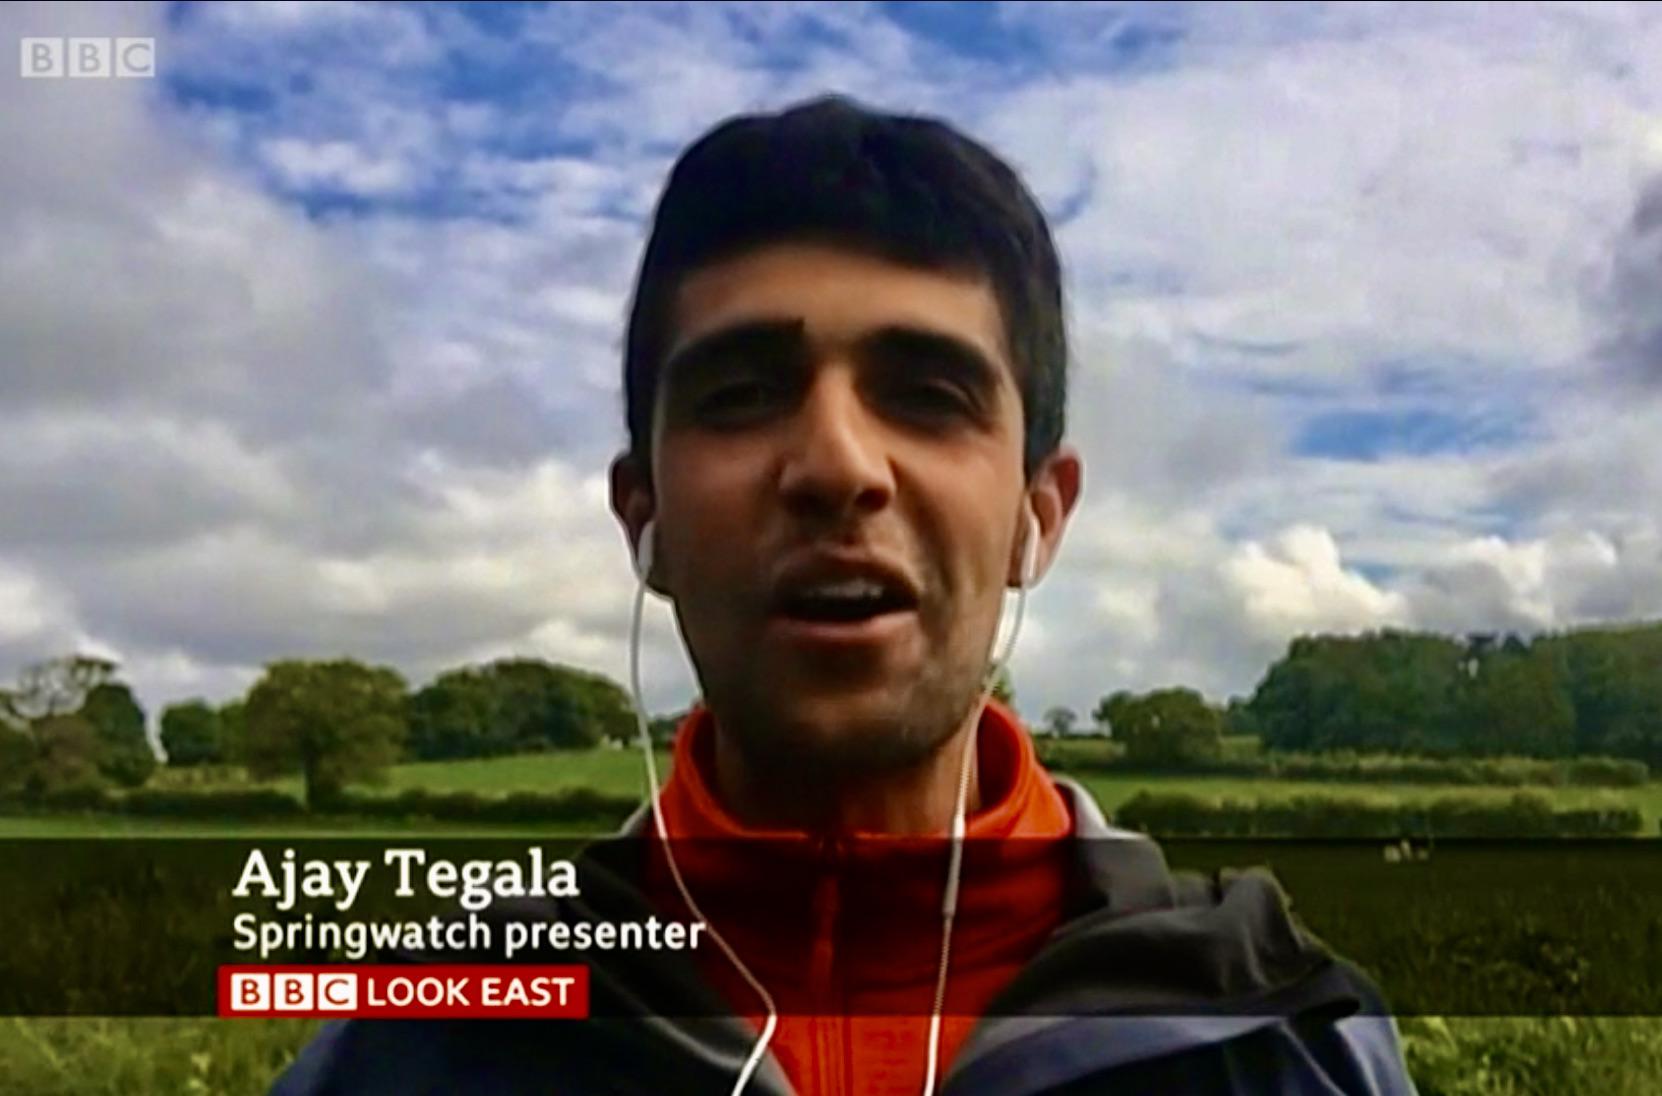 Ajay Tegala on BBC Look East